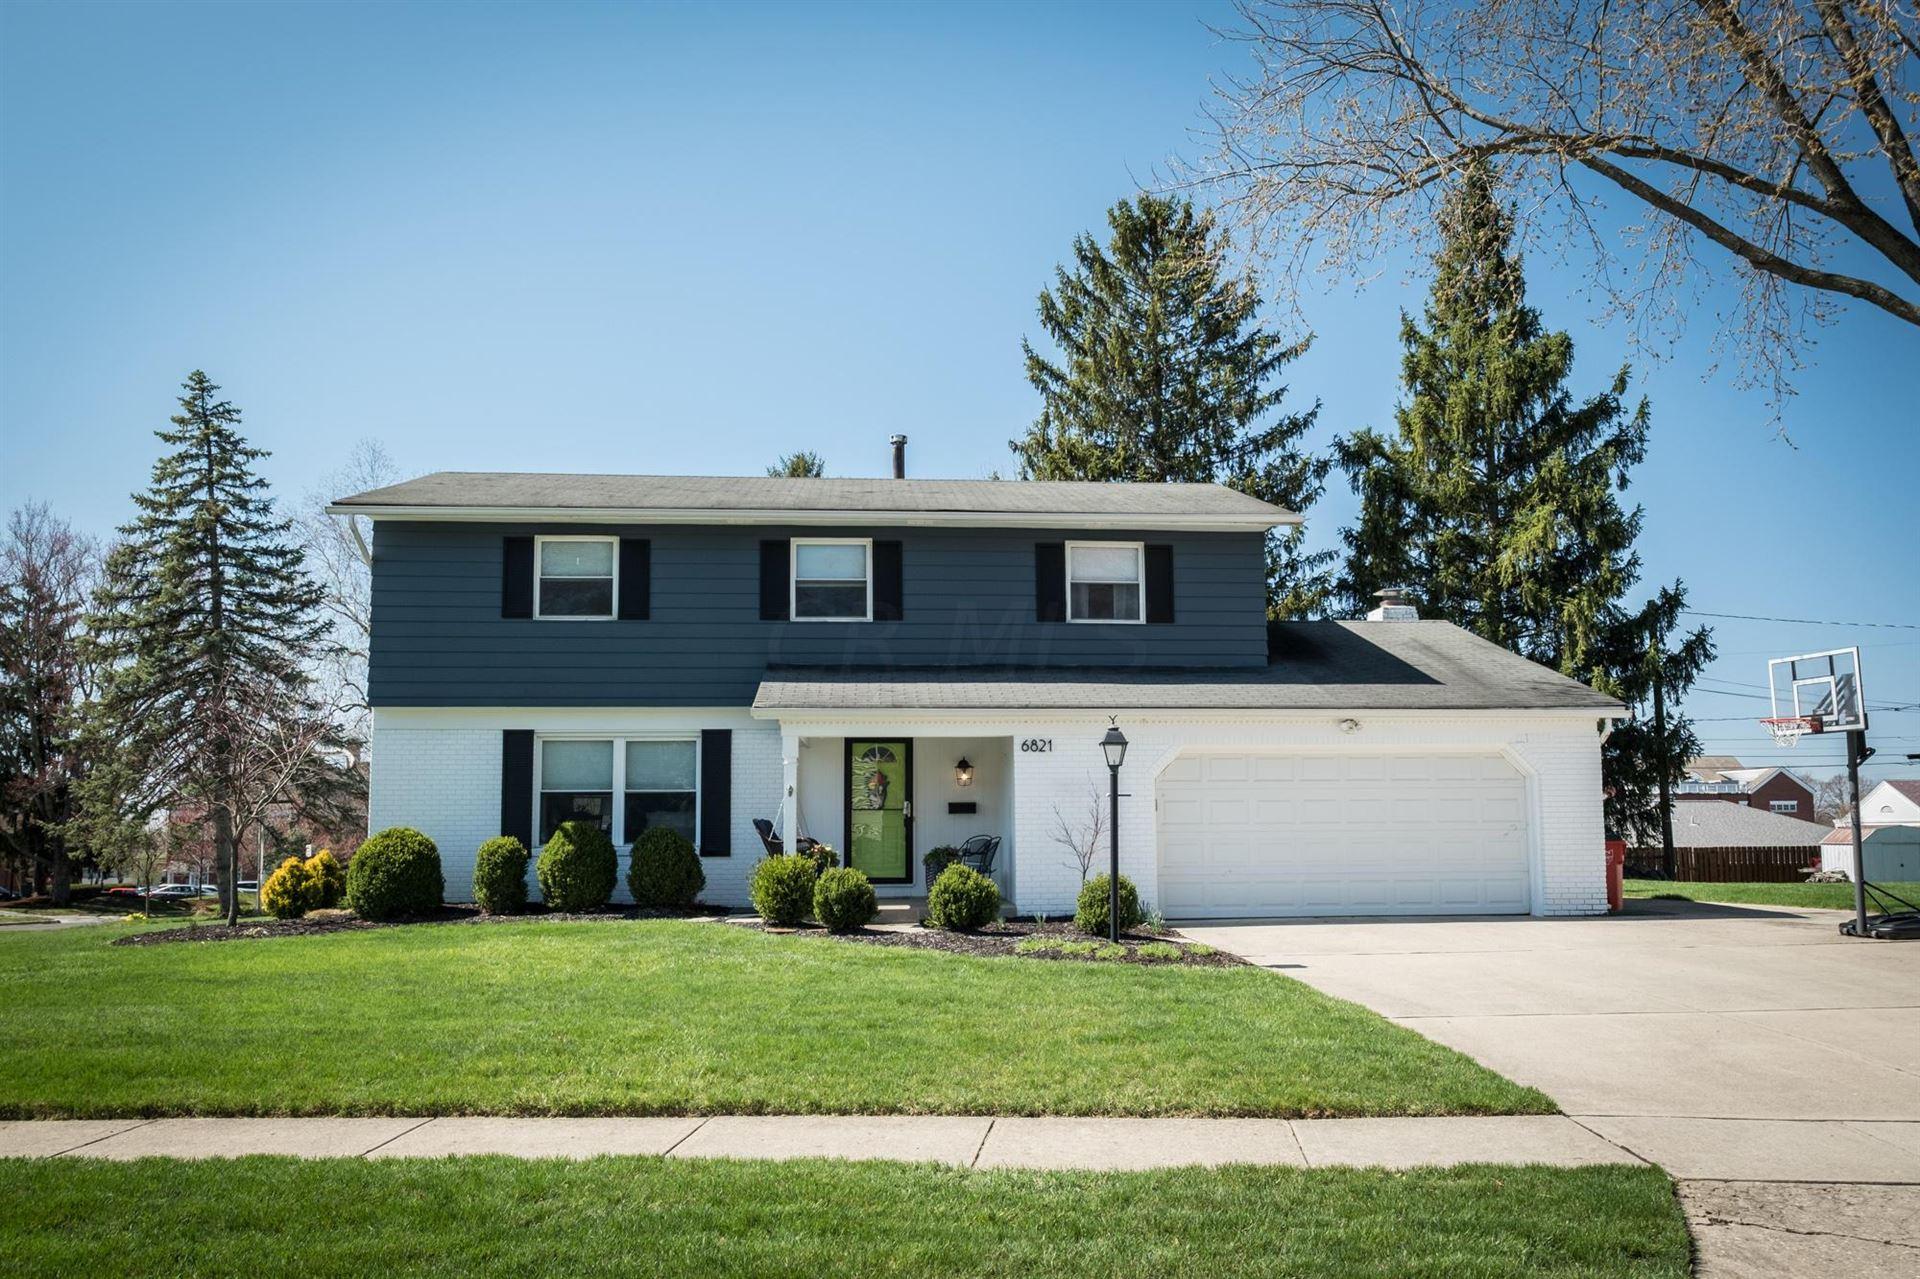 6821 Abbot Place, Worthington, OH 43085 - MLS#: 221010020